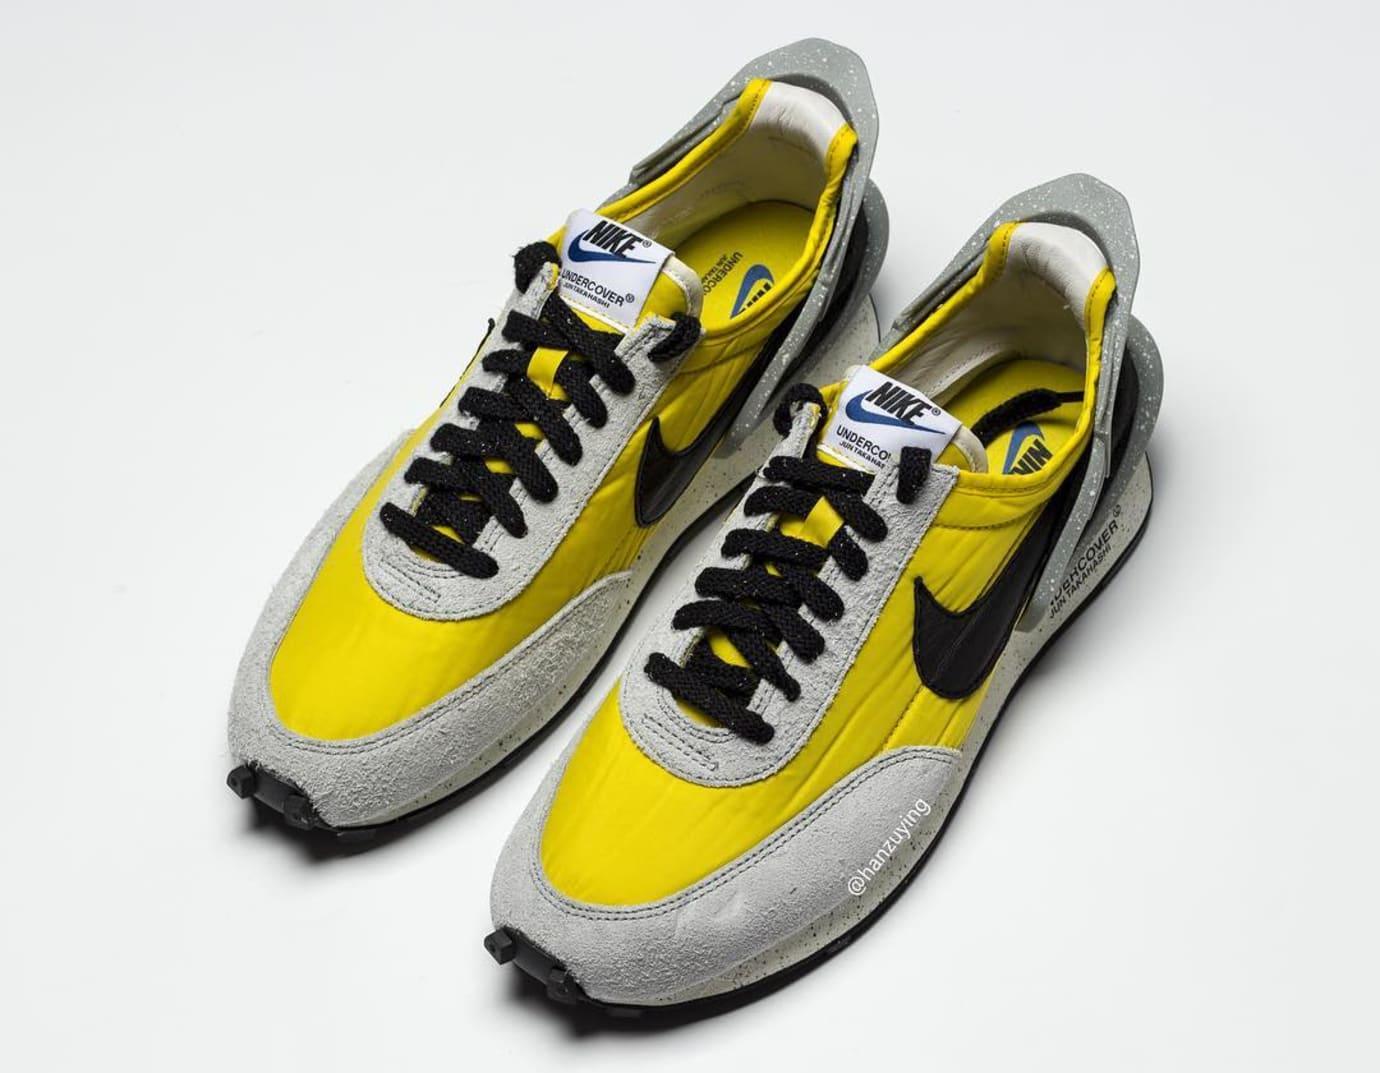 Undercover x Nike Daybreak Yellow/Grey BV4594-700 Top